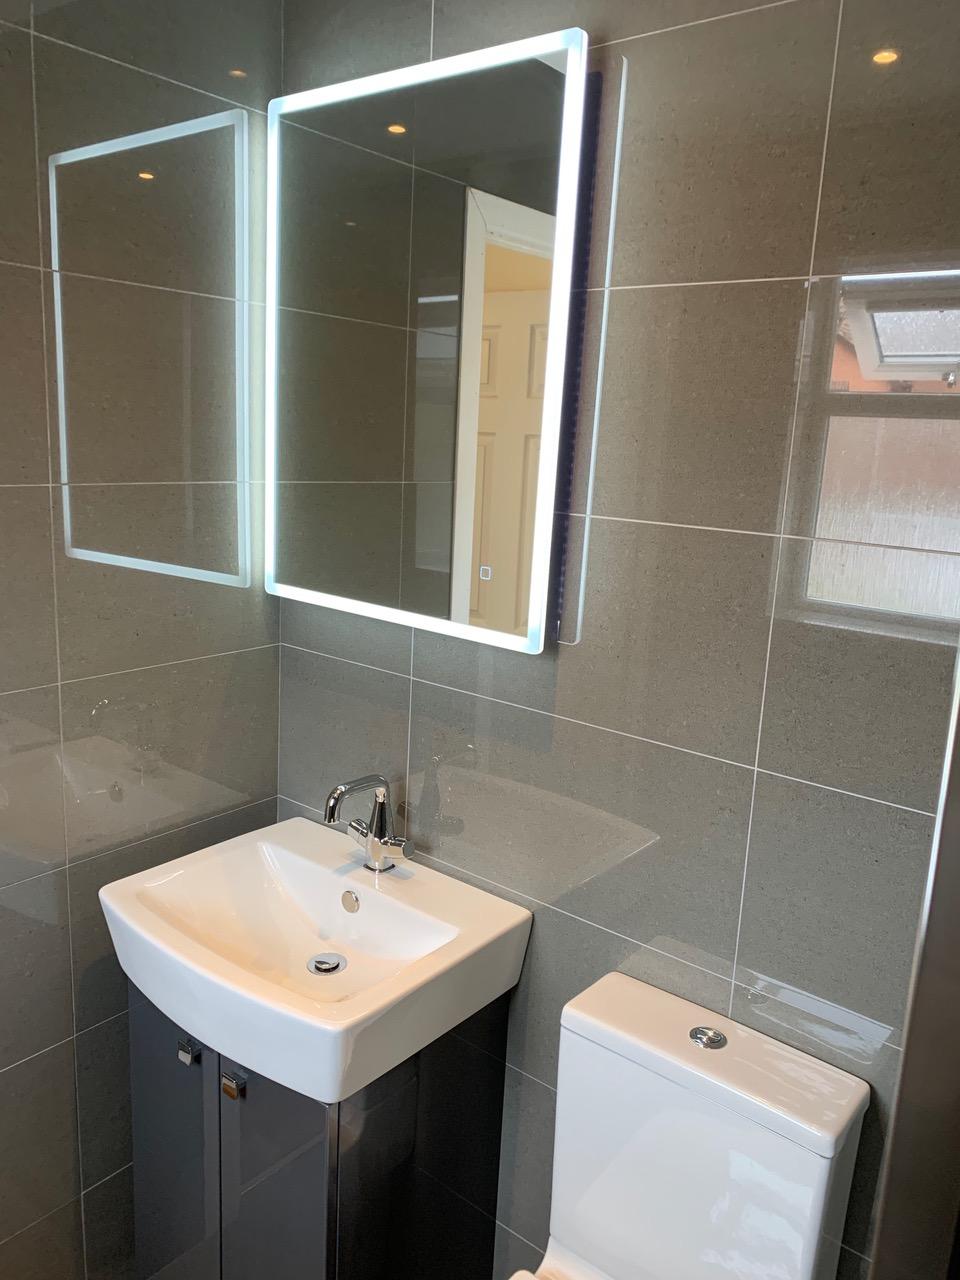 IMG_8635 - Ecoflo UK Kitchens, Bathrooms & property ...